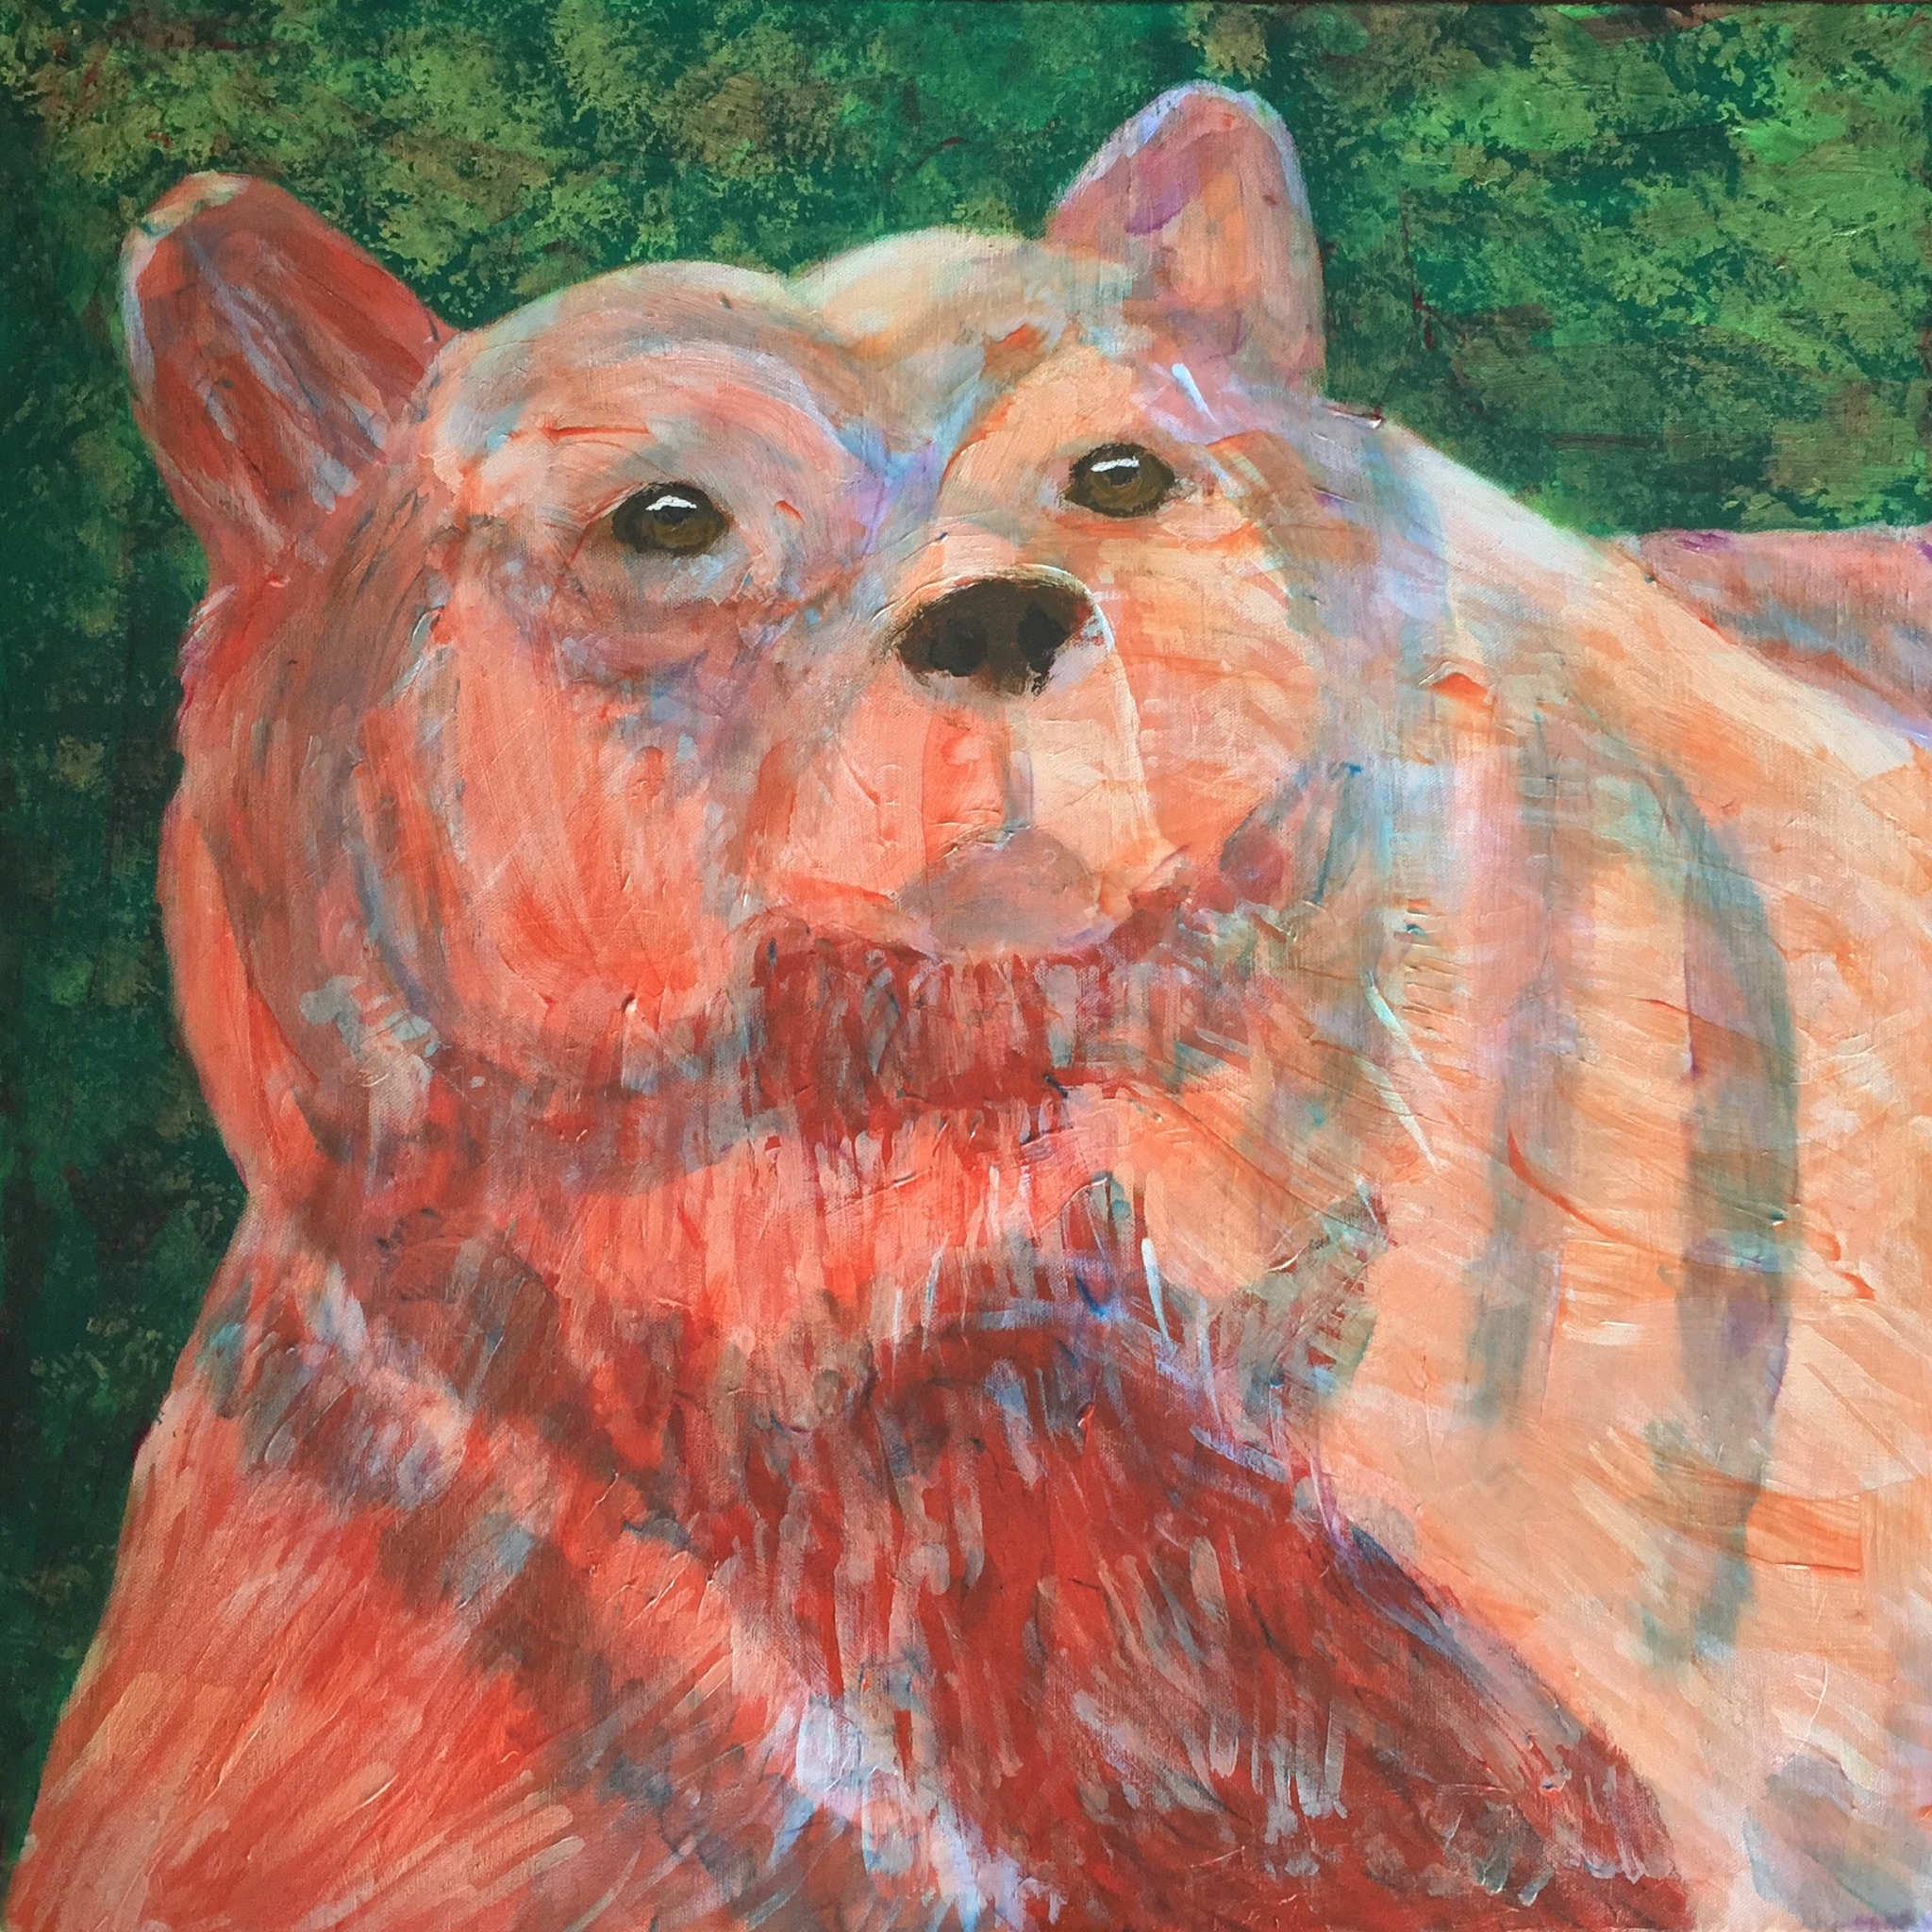 Alaskan Bear - - Original for Sale - Prints Available